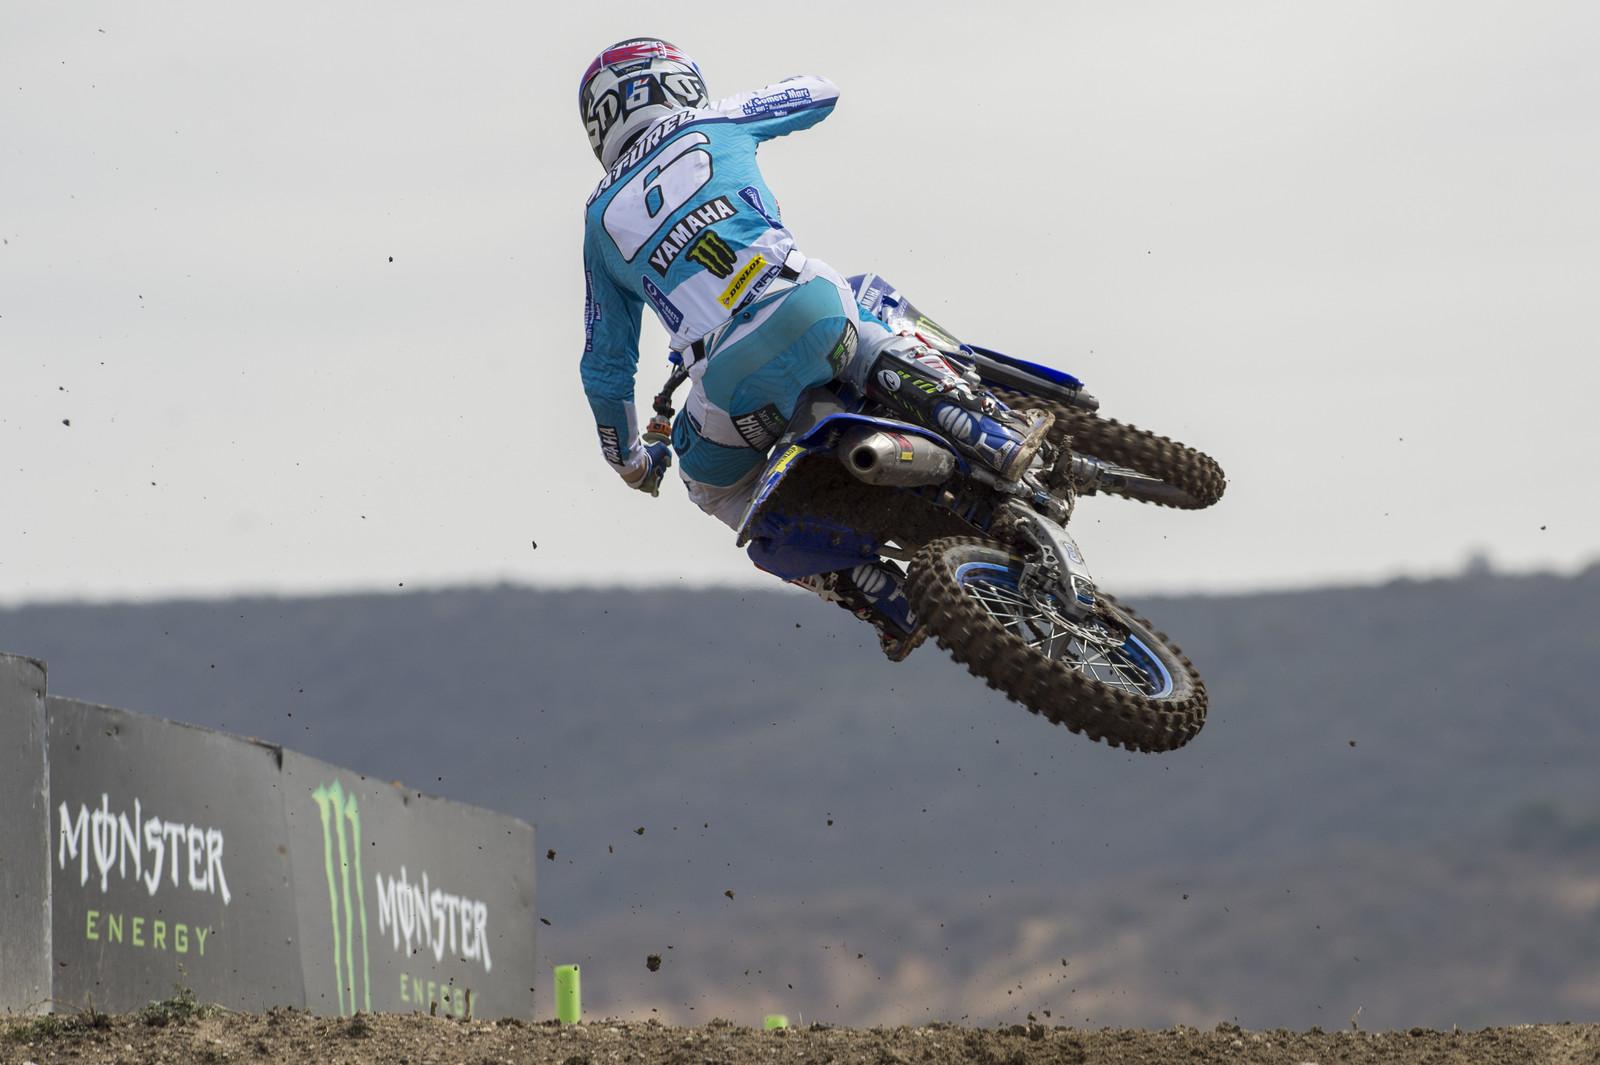 Benoit Paturel - Photo Blast: 2017 MXGP of Mexico - Motocross Pictures - Vital MX